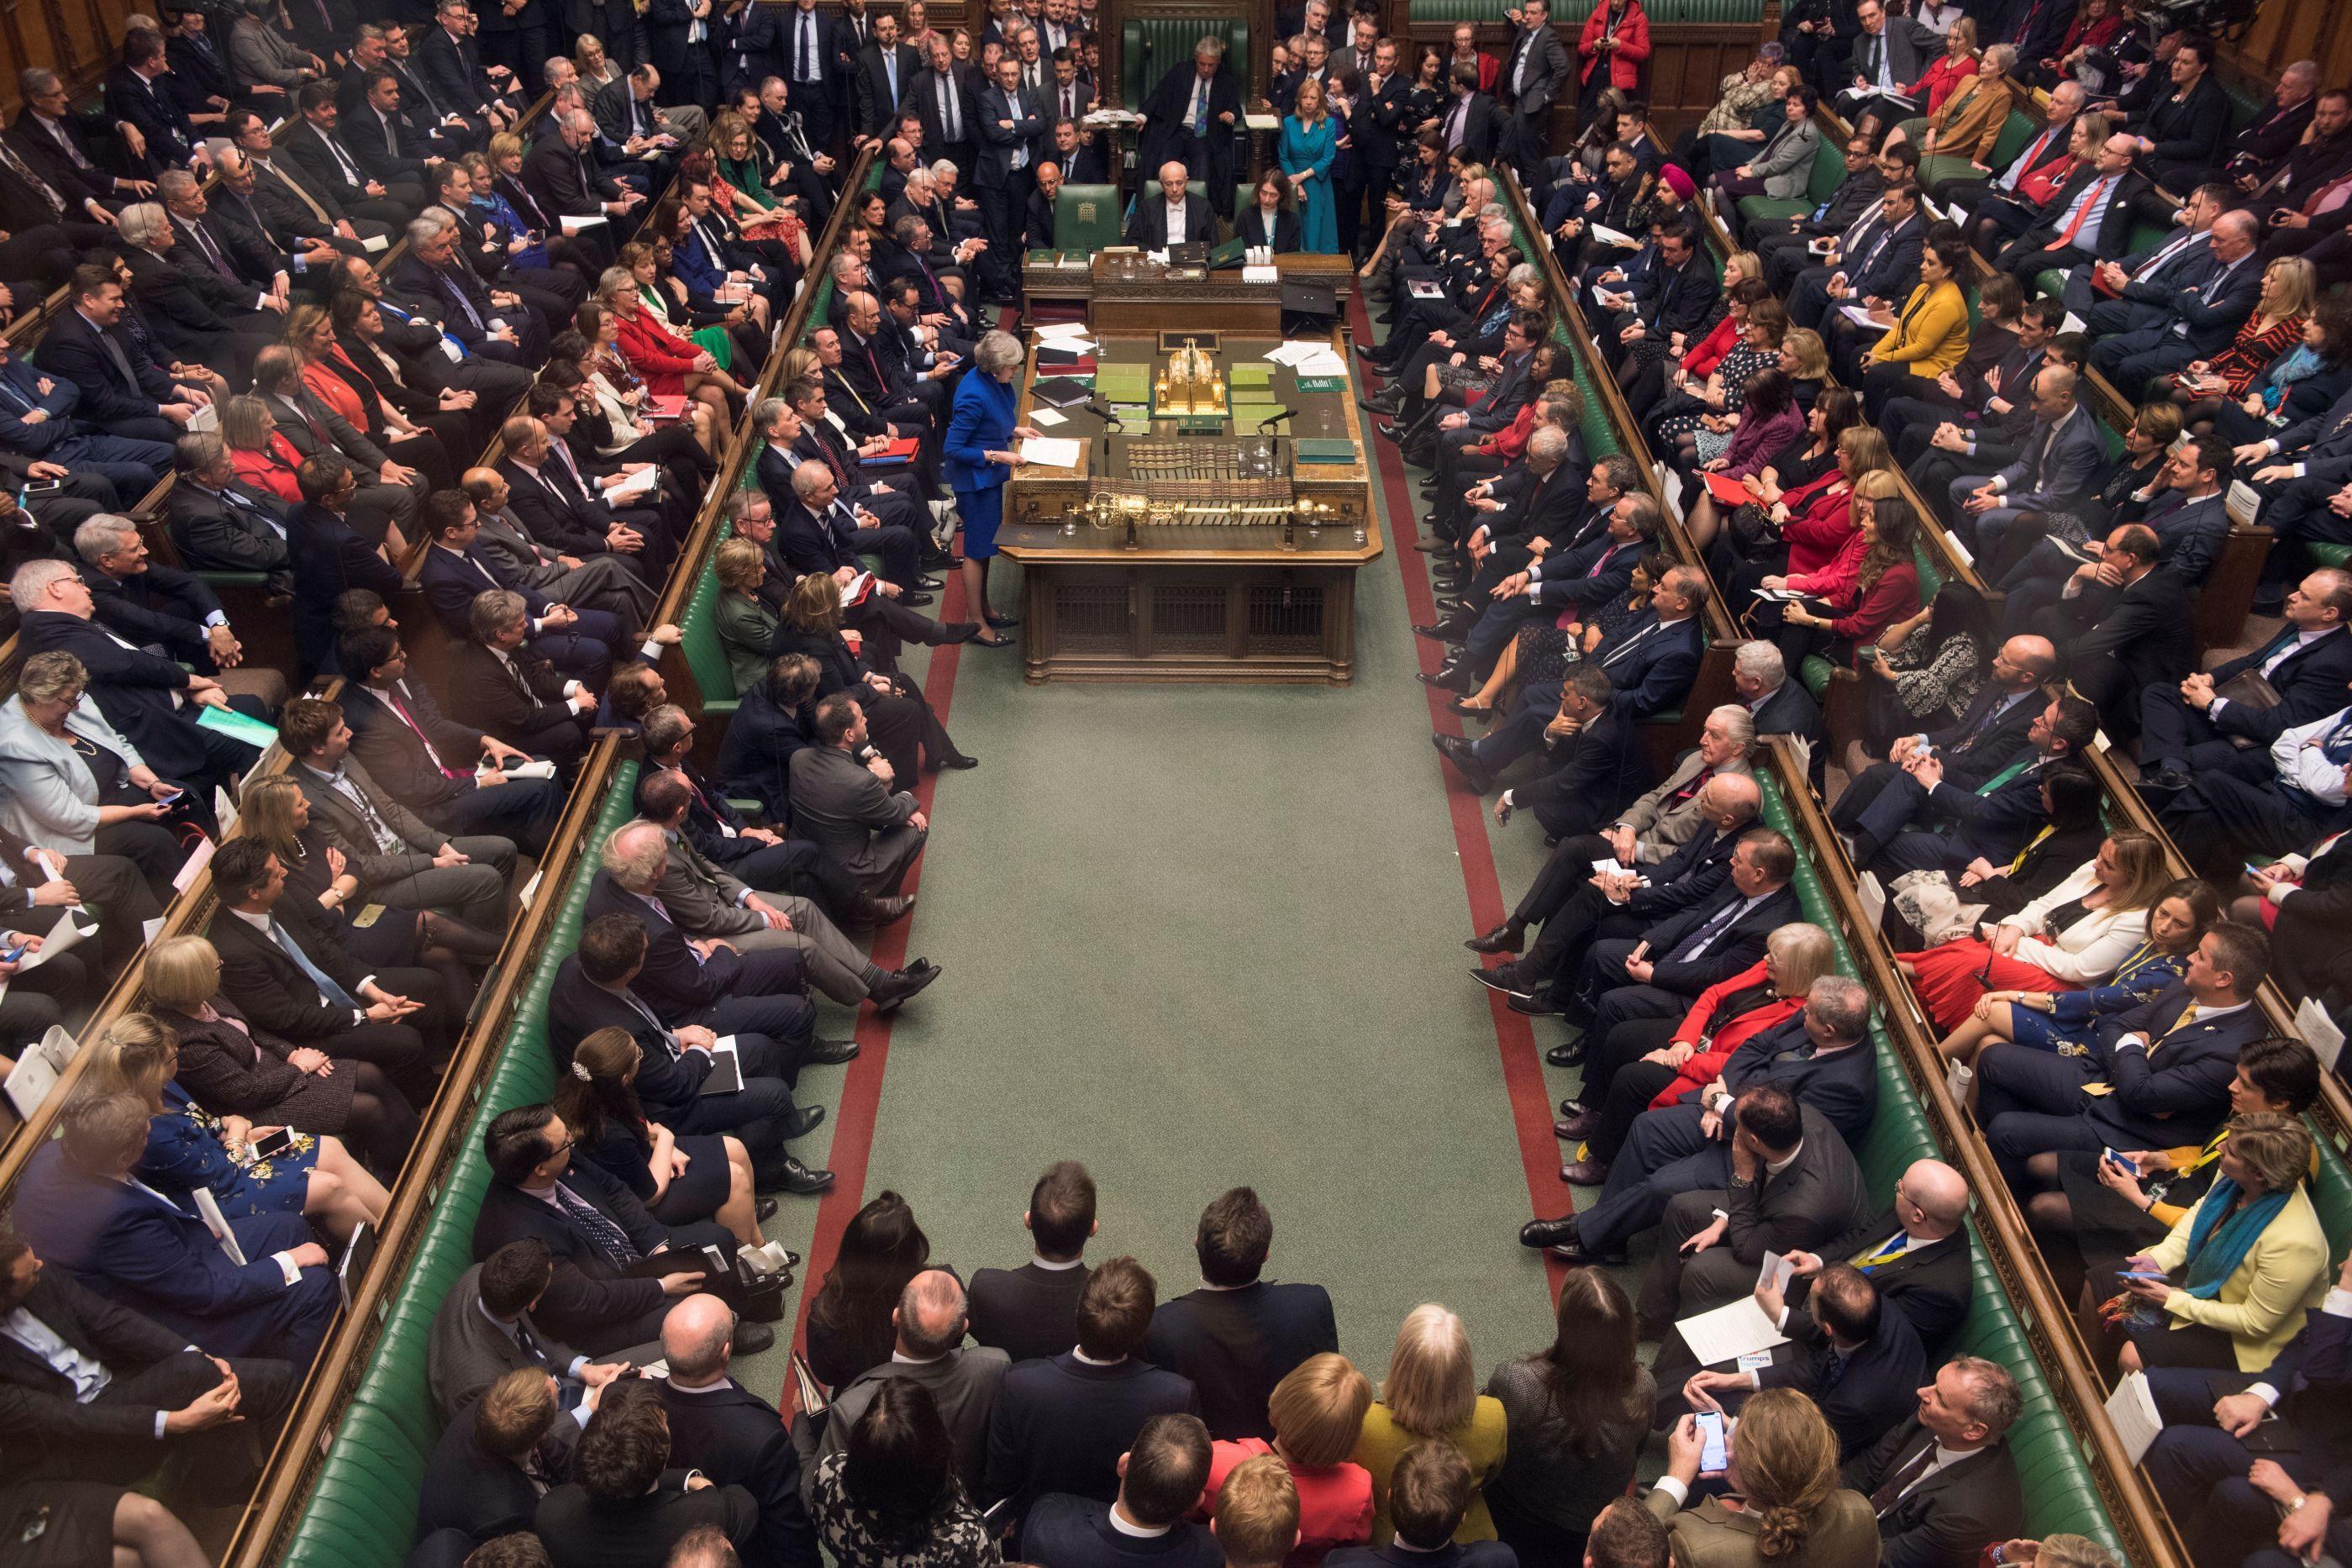 Parlamento britânico vota adiamento curto ou longo do Brexit